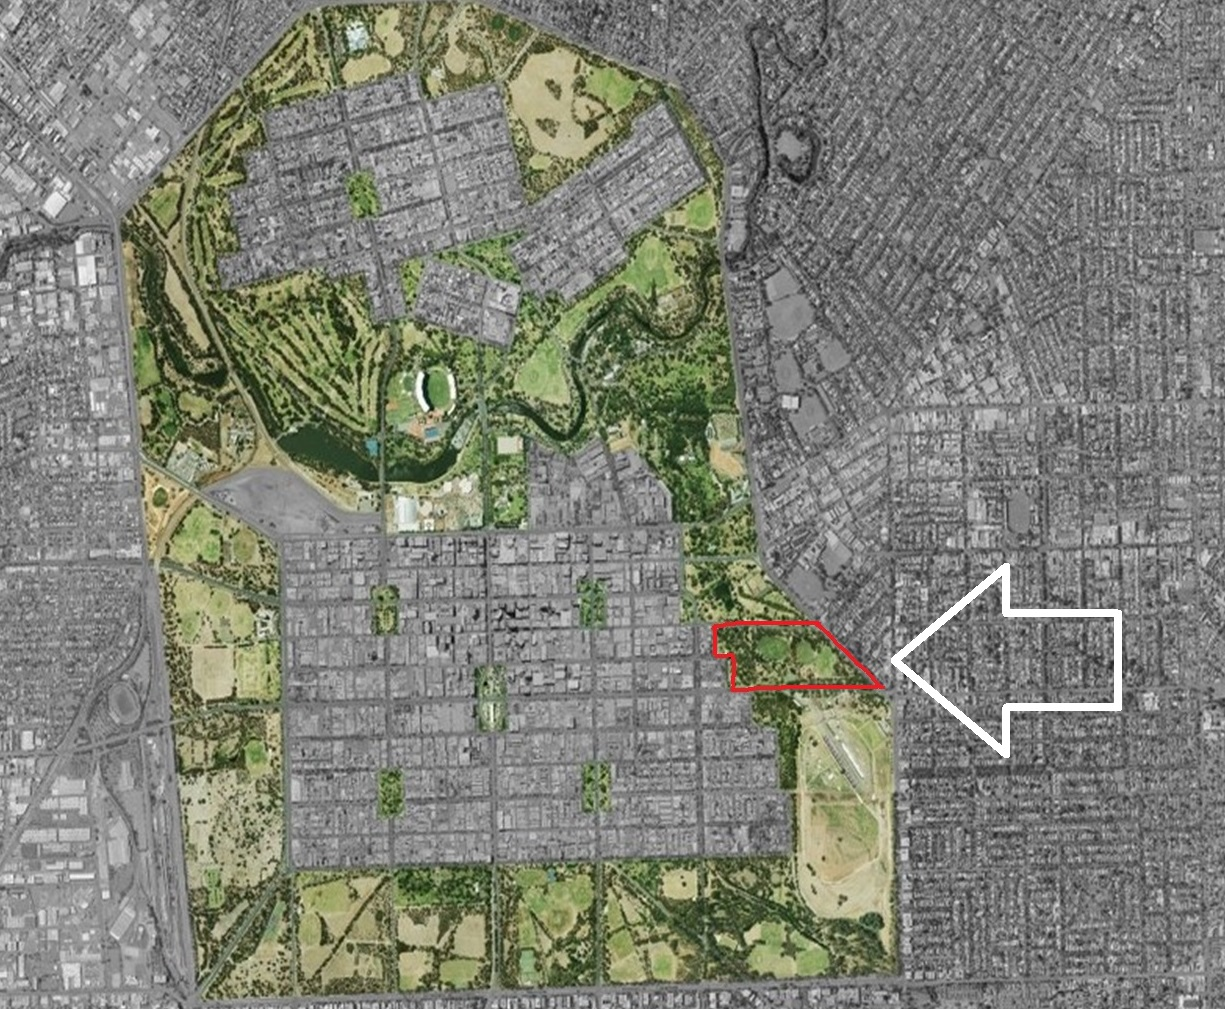 King Rodney Park / Ityamai-itpina (Park 15)